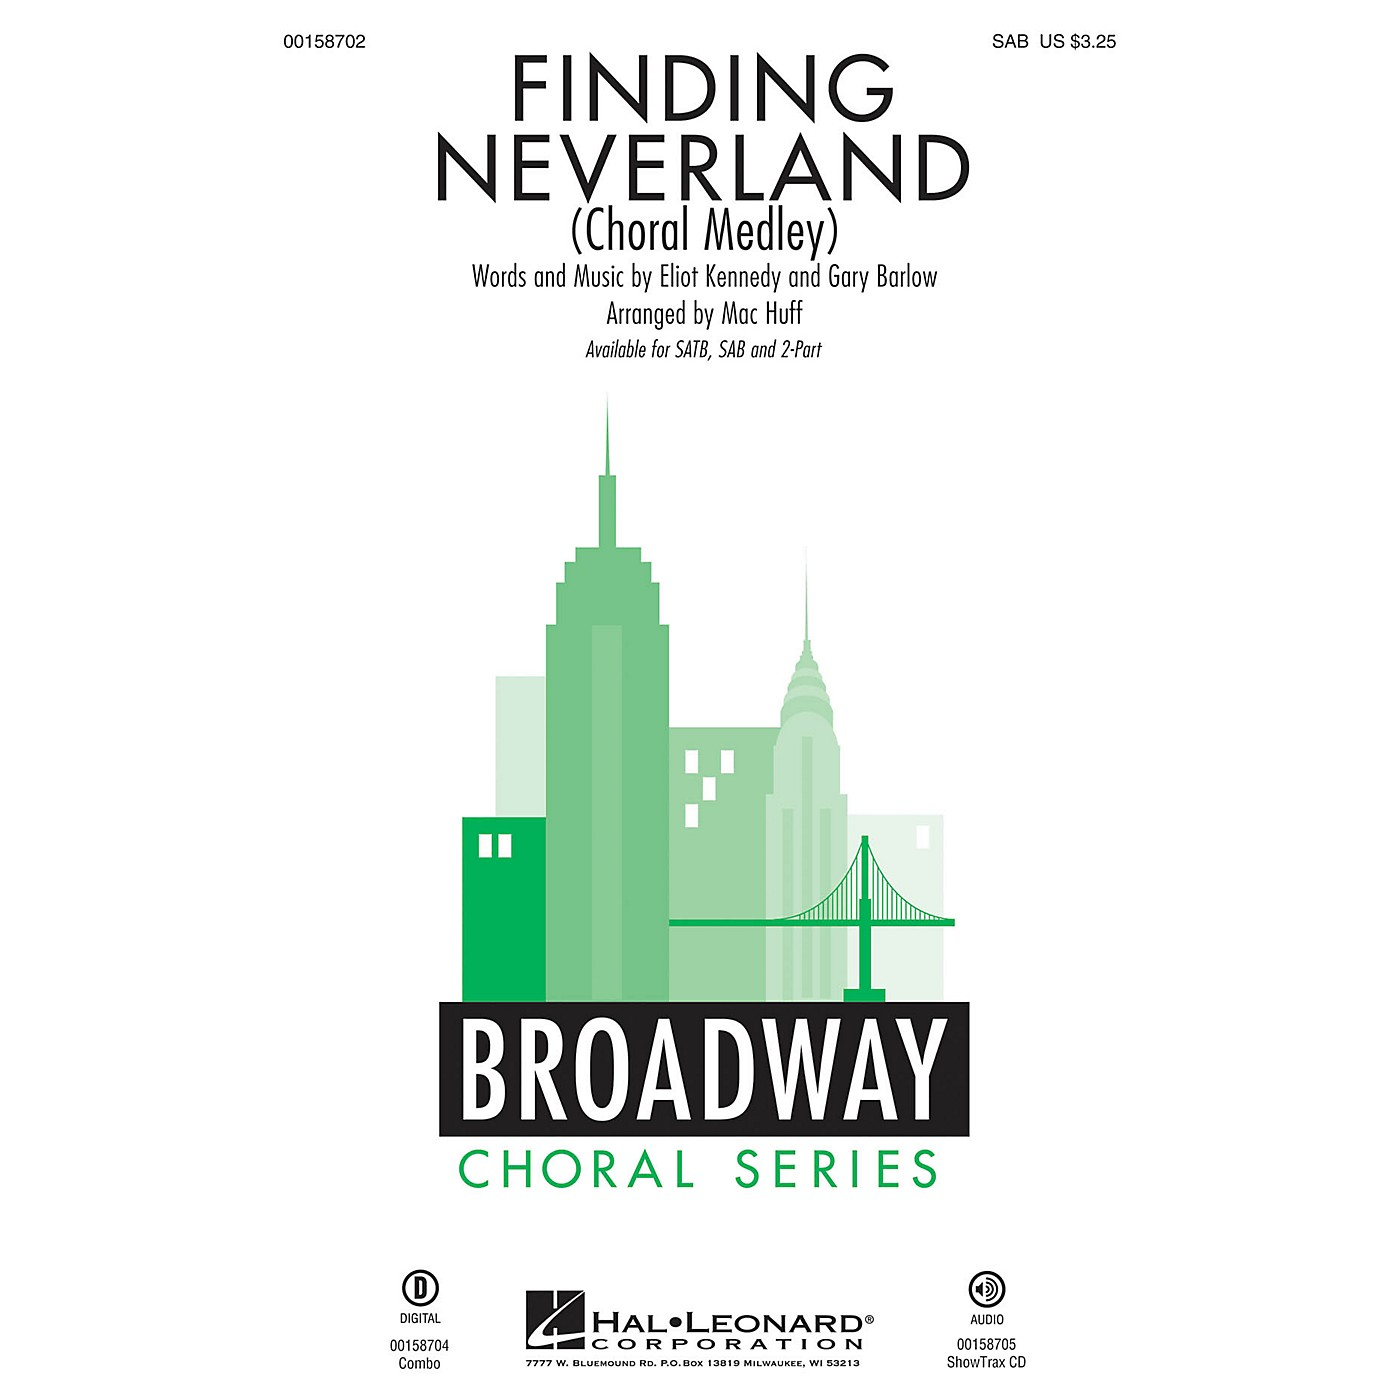 Hal Leonard Finding Neverland (Choral Medley) SAB arranged by Mac Huff thumbnail